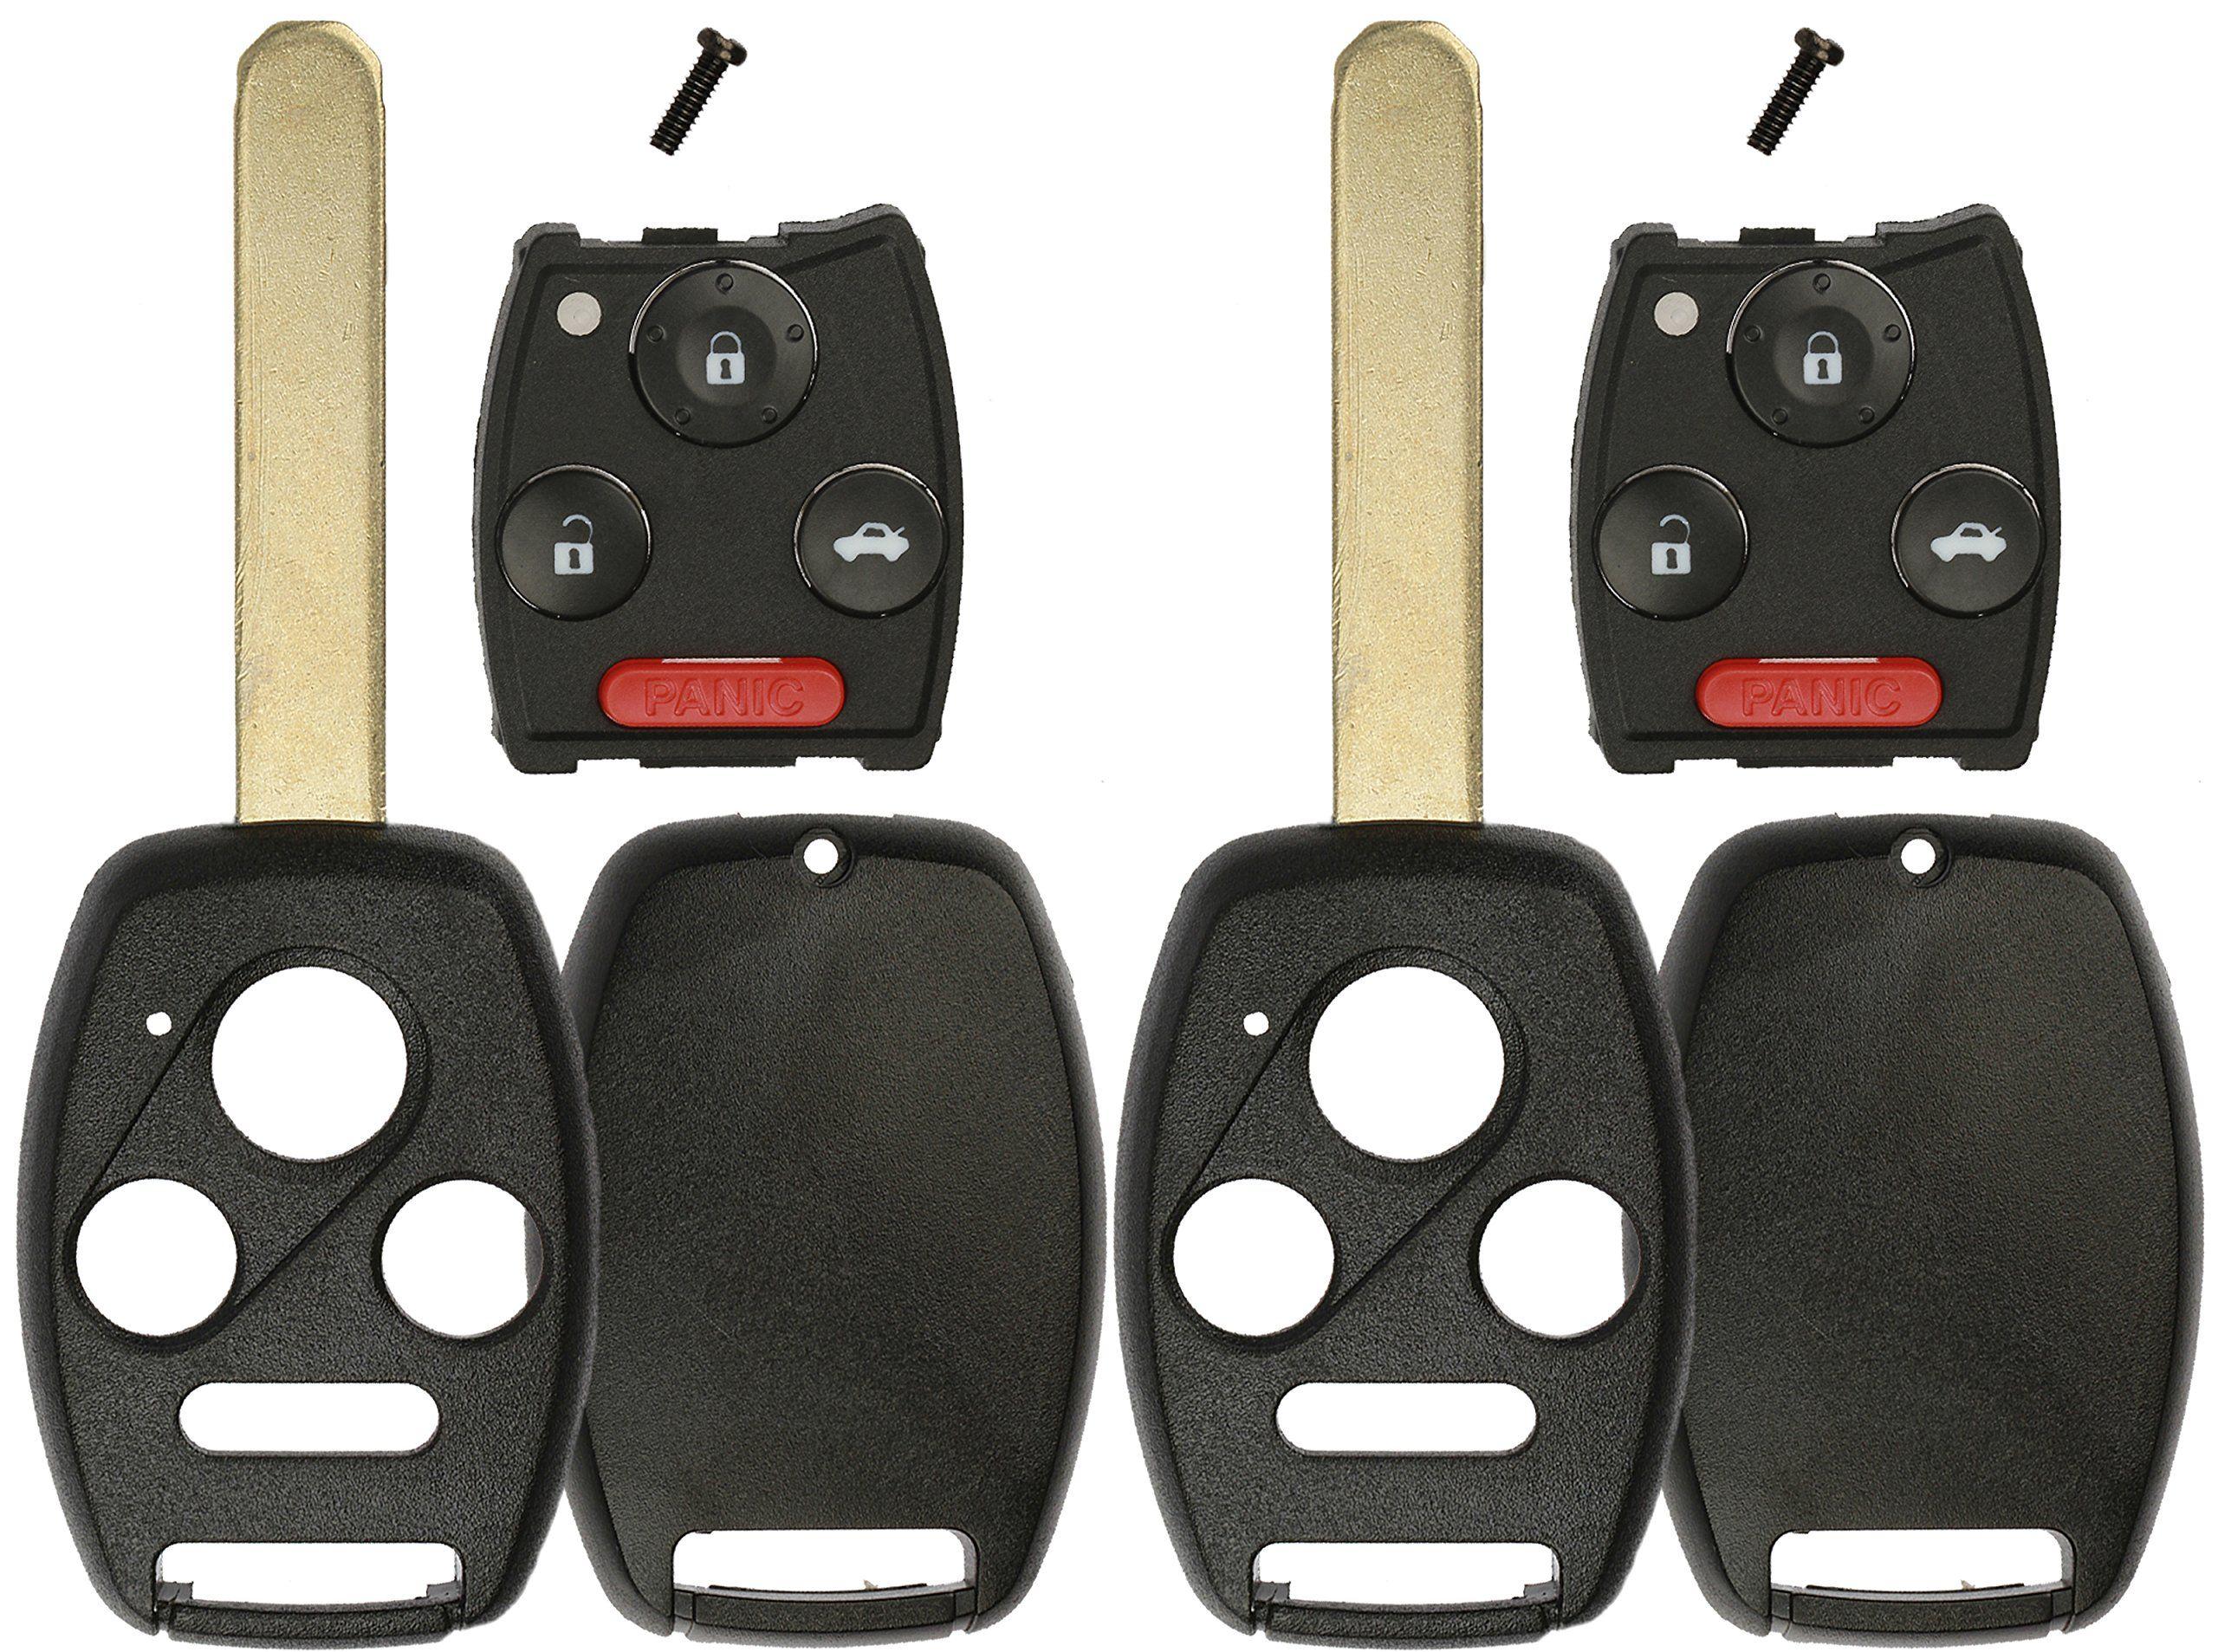 Keylessoption Keyless Remote Uncut Car Key Fob Shell And Button